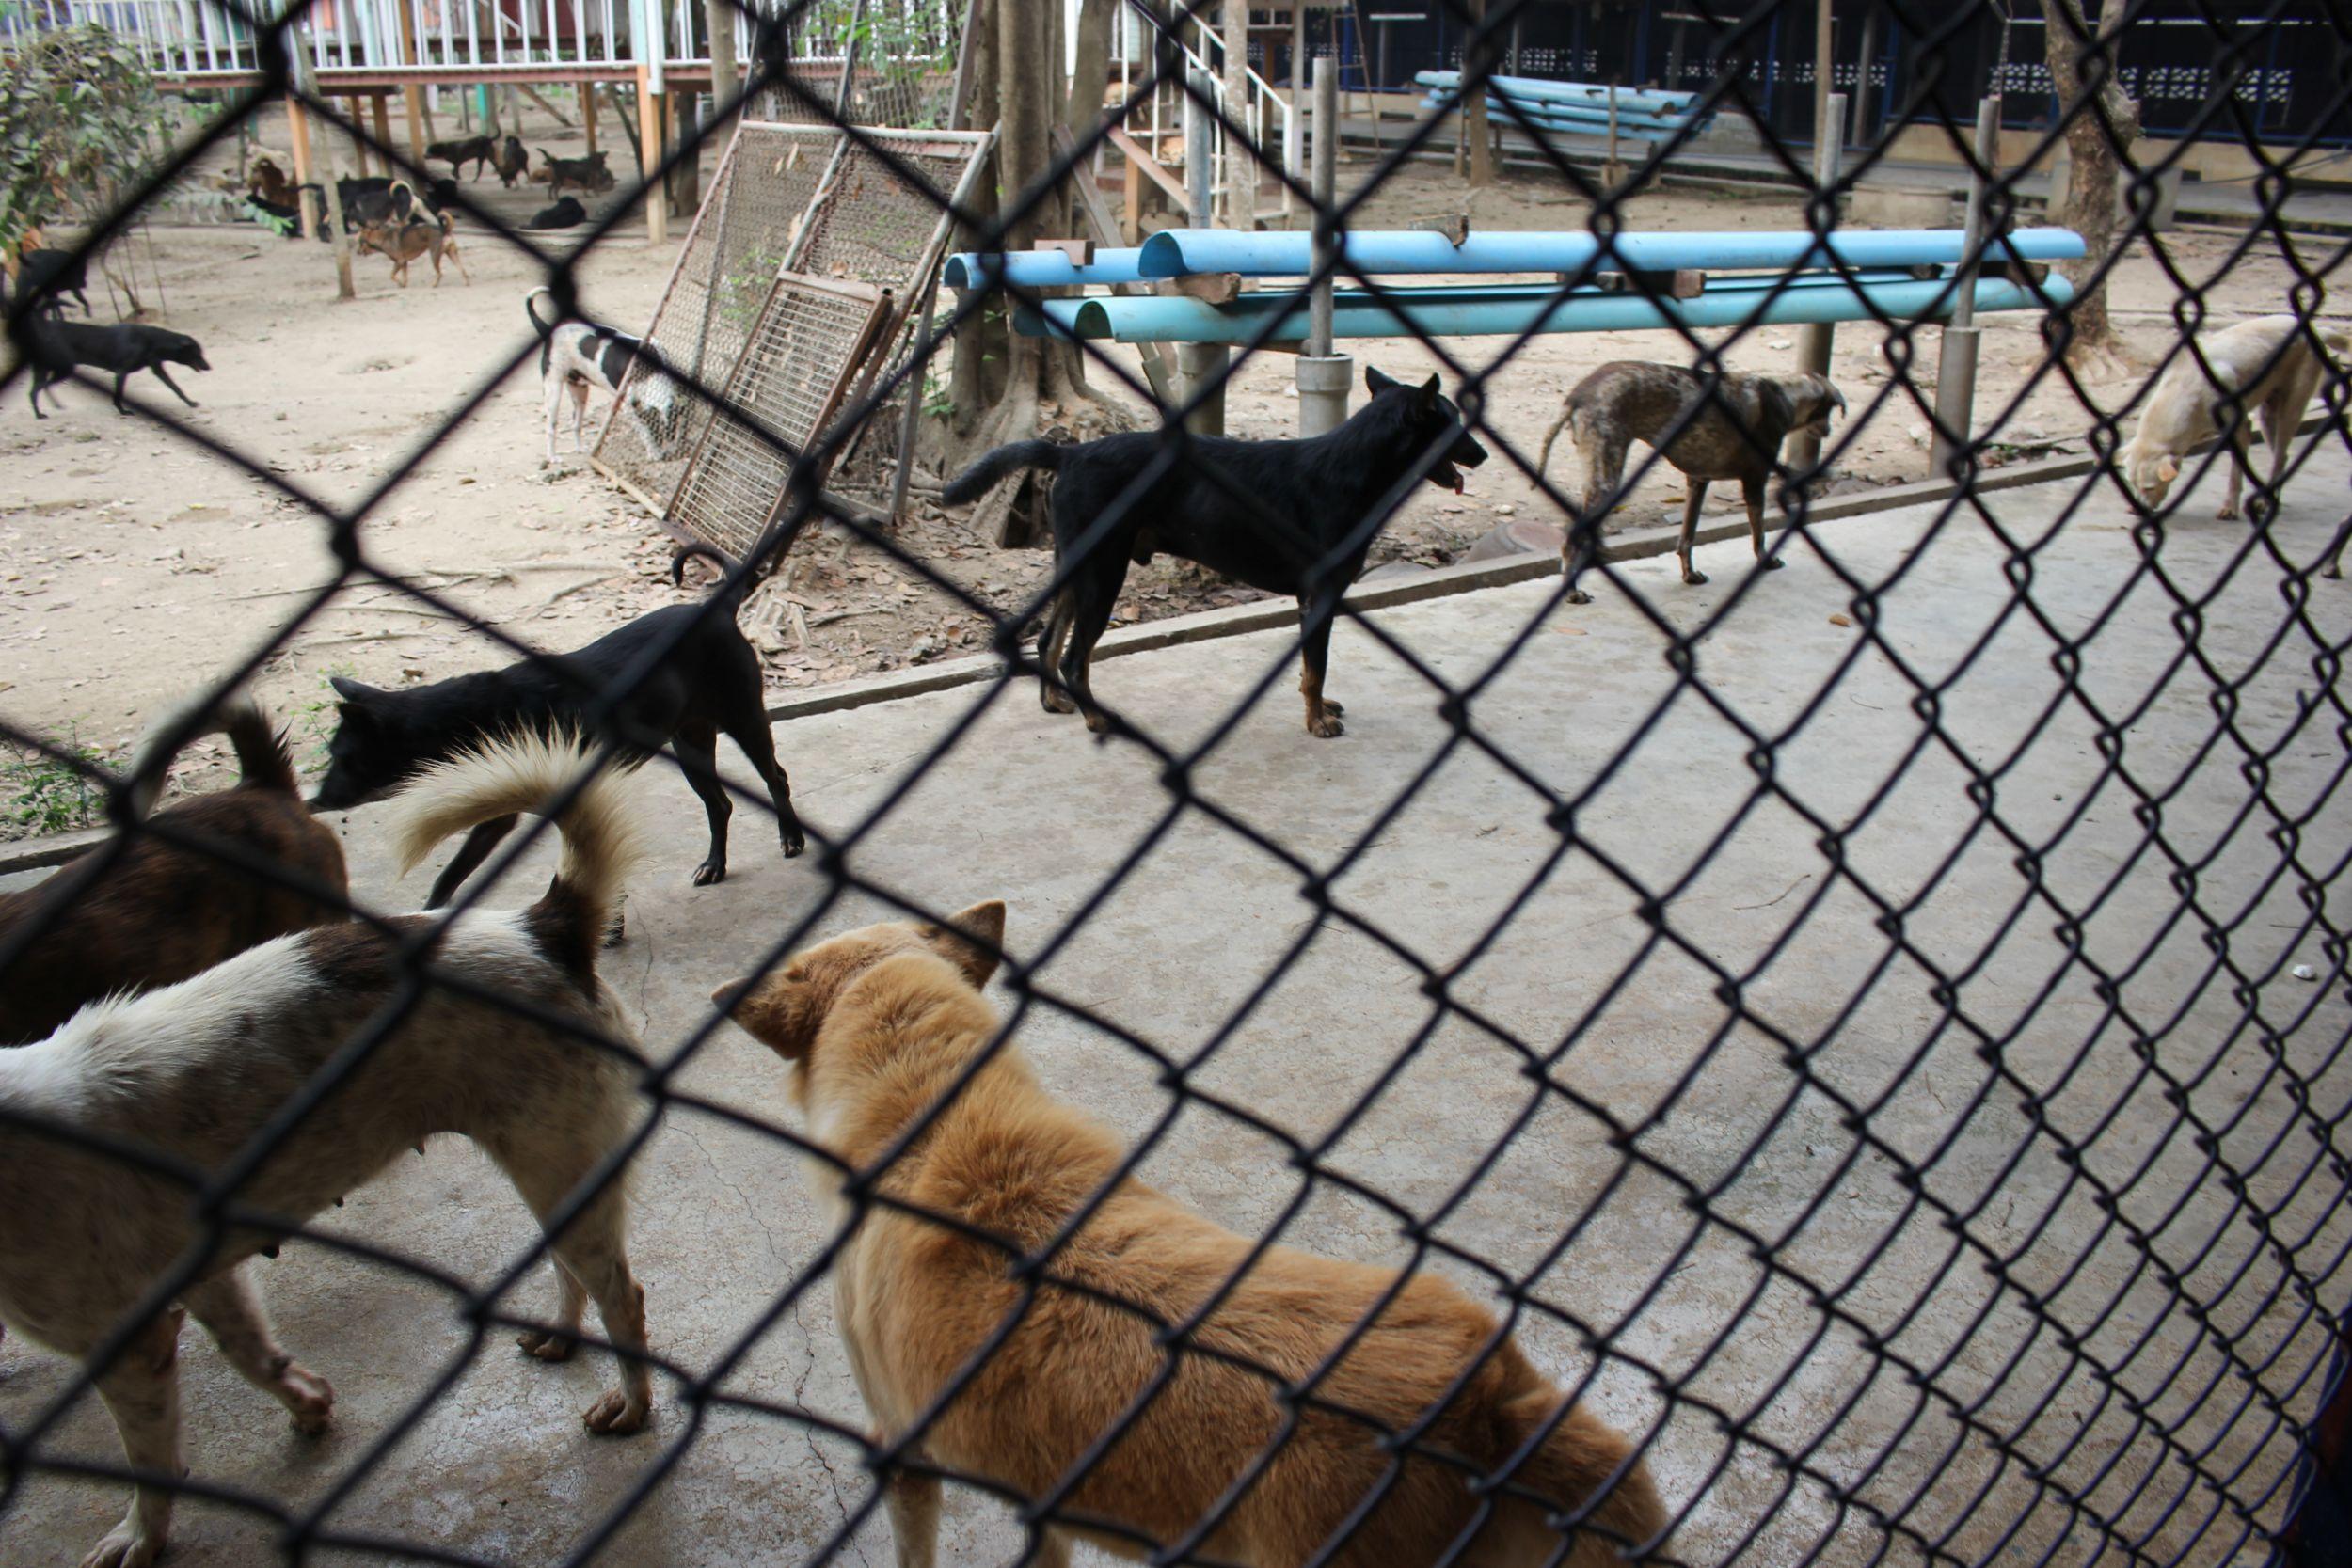 Dogilike.com :: โรงพยาบาลสัตว์ทองหล่อจัดกิจกรรม ฉีดวัคซีนให้น้องหมา